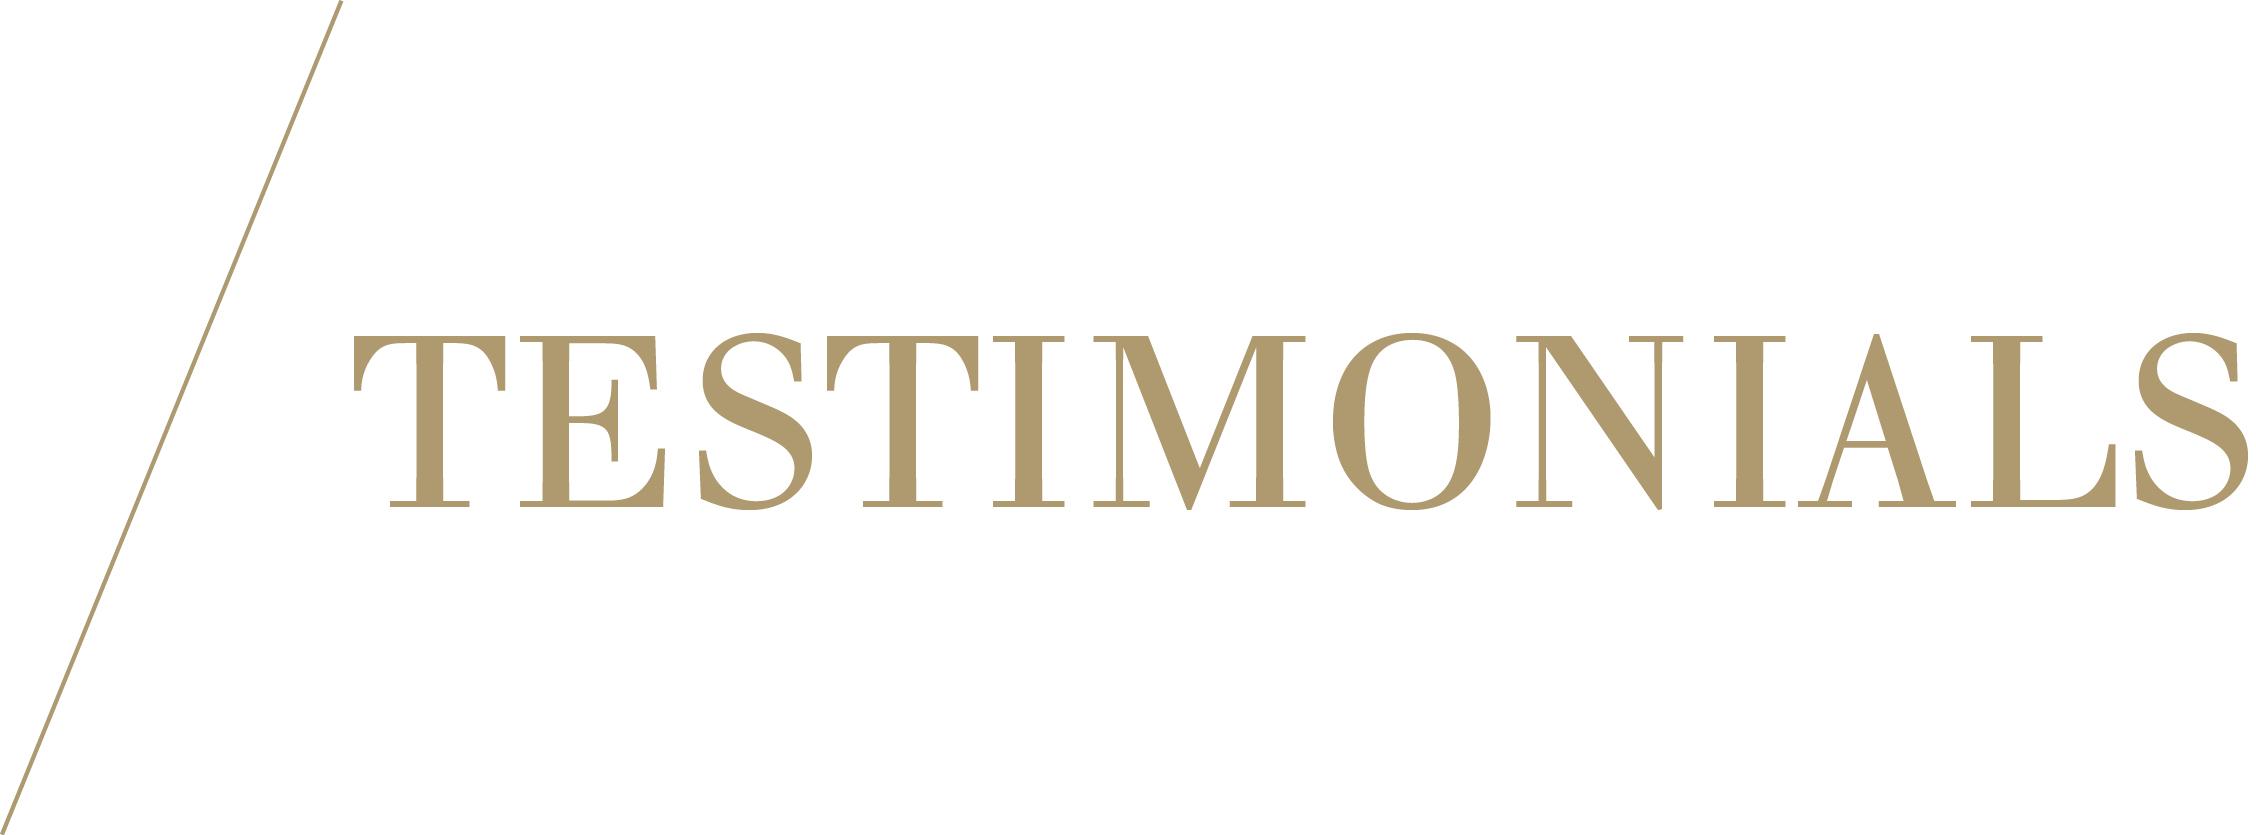 testimonials-text-serif.jpg